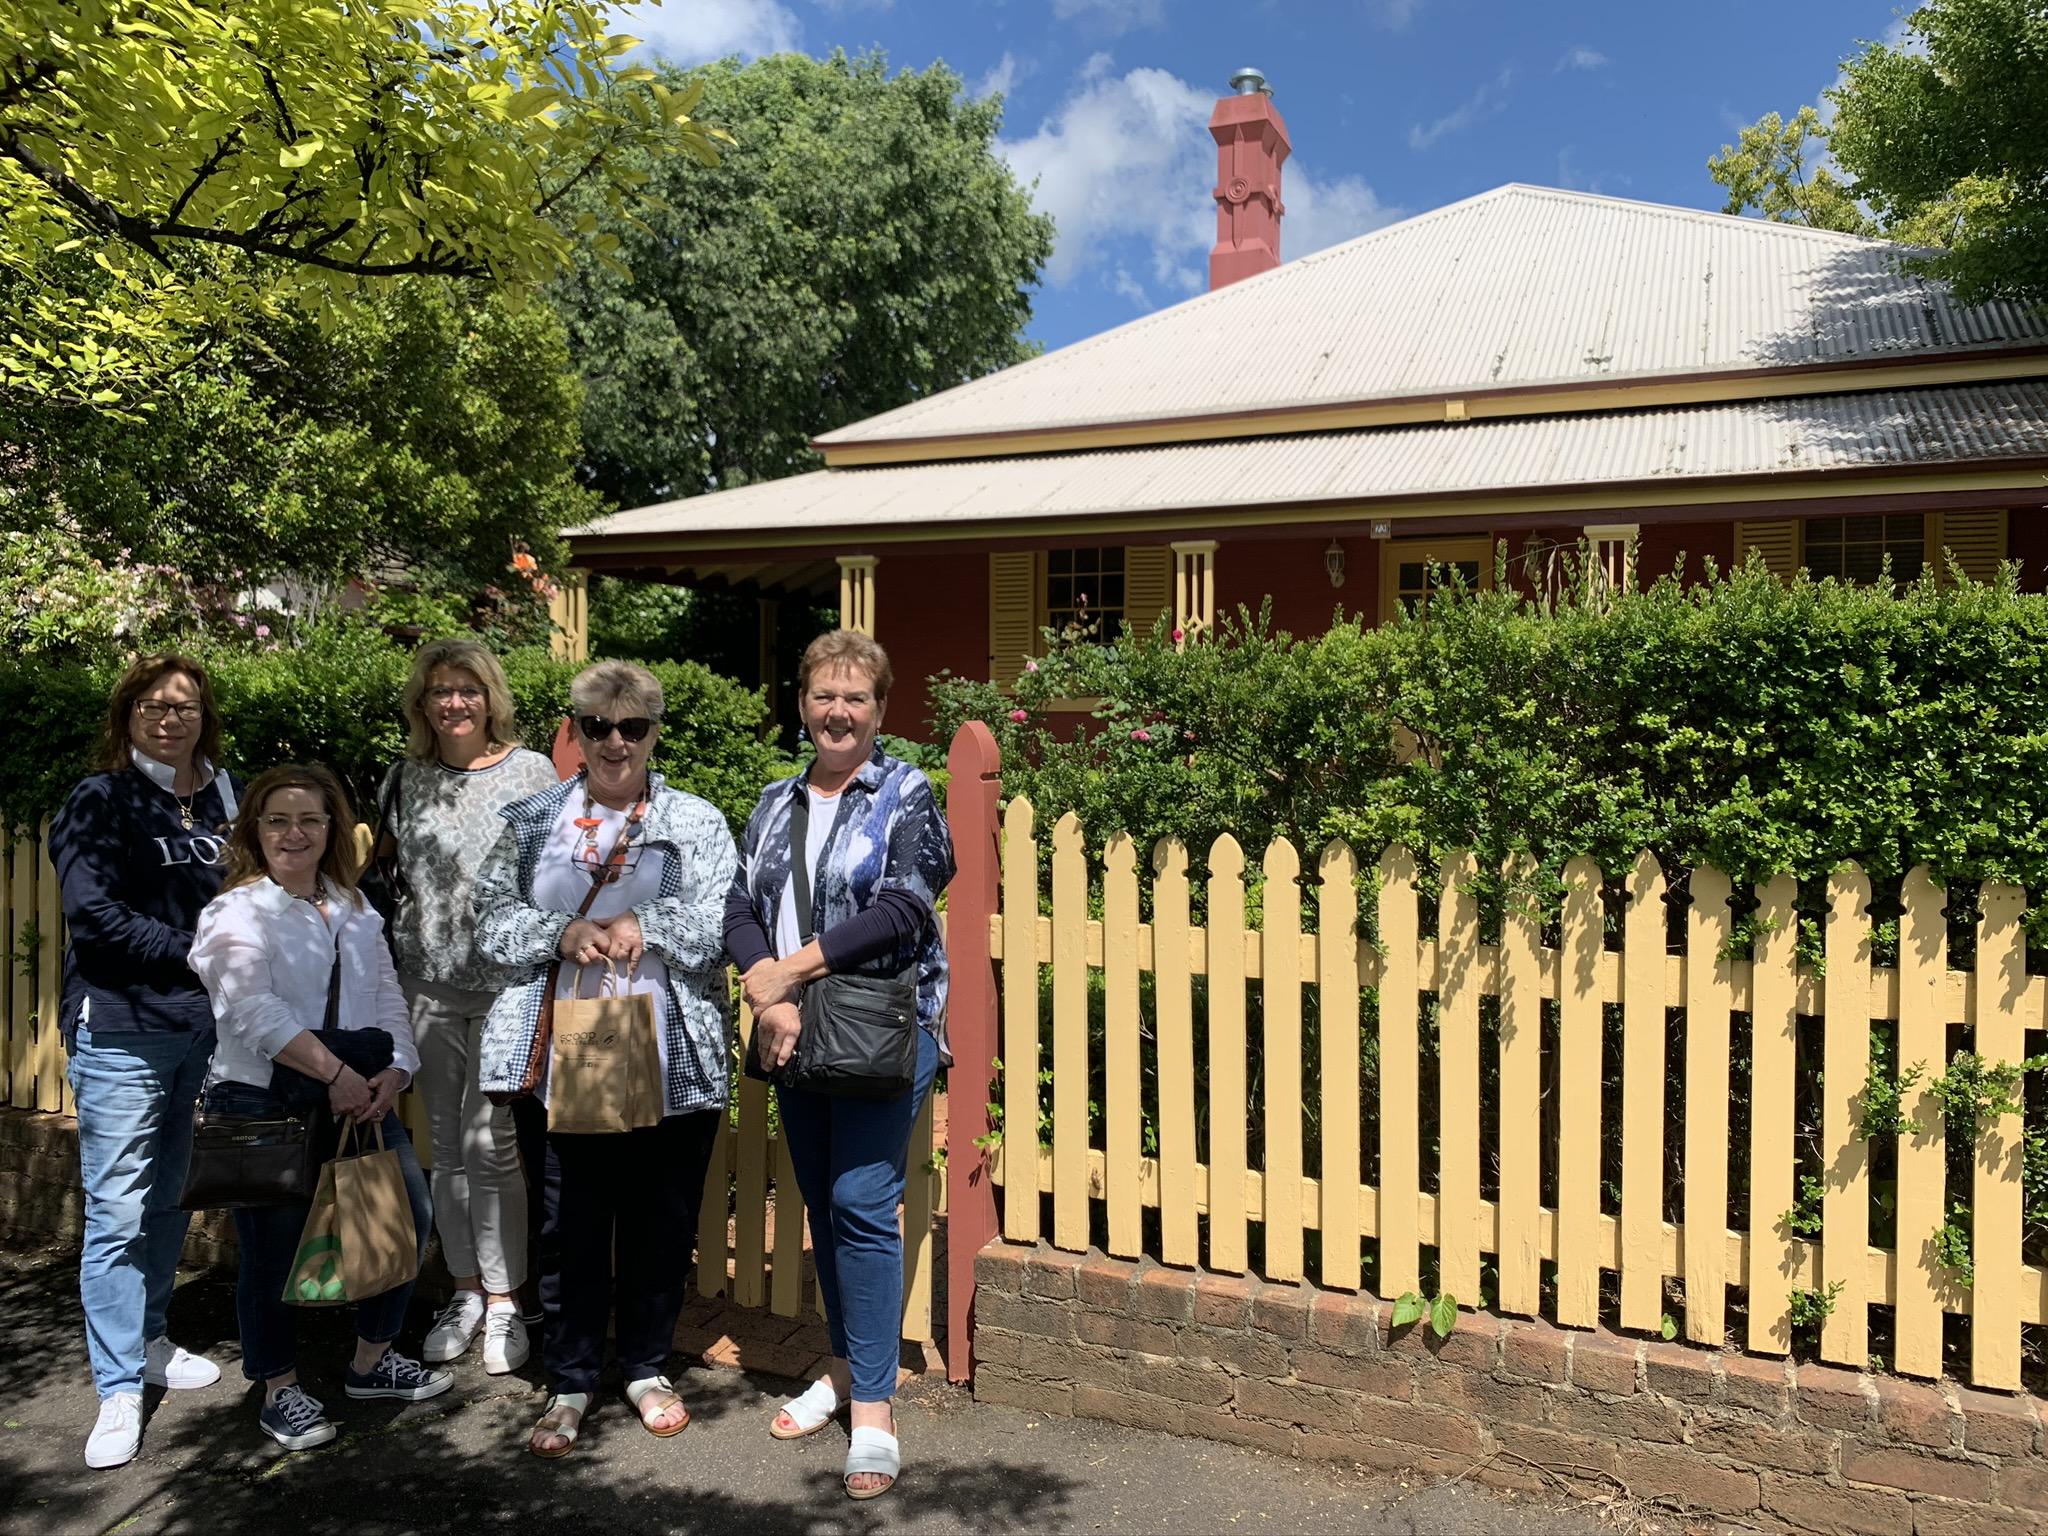 5 ladies standing in front of heritage building